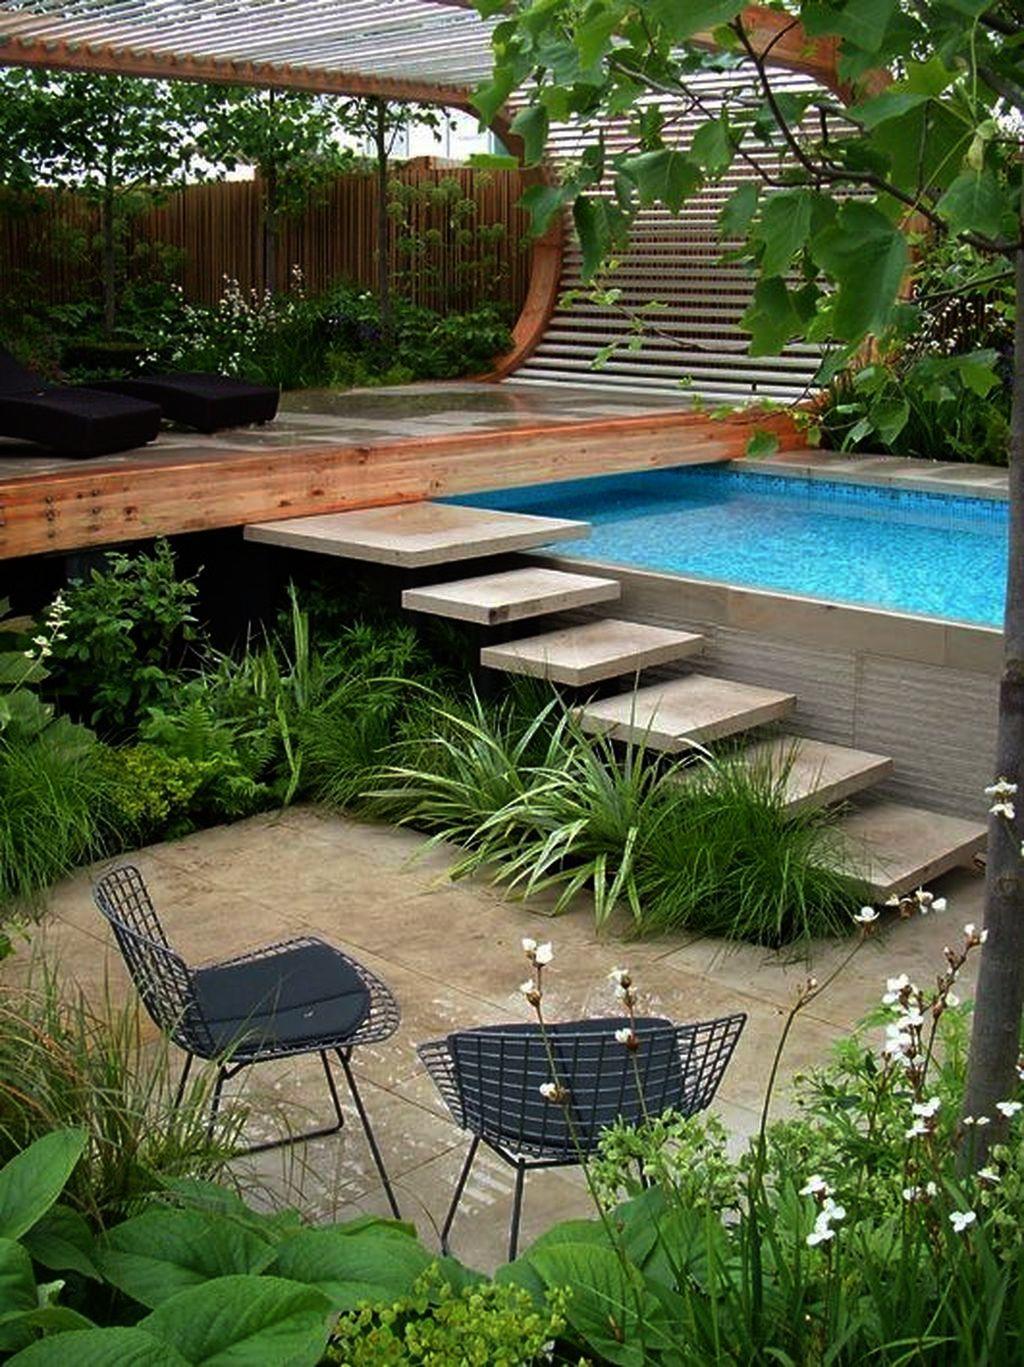 Simple But Wonderful Backyard Landscape Design 05 Backyard Pool Designs Swimming Pools Backyard Backyard Pool Landscaping